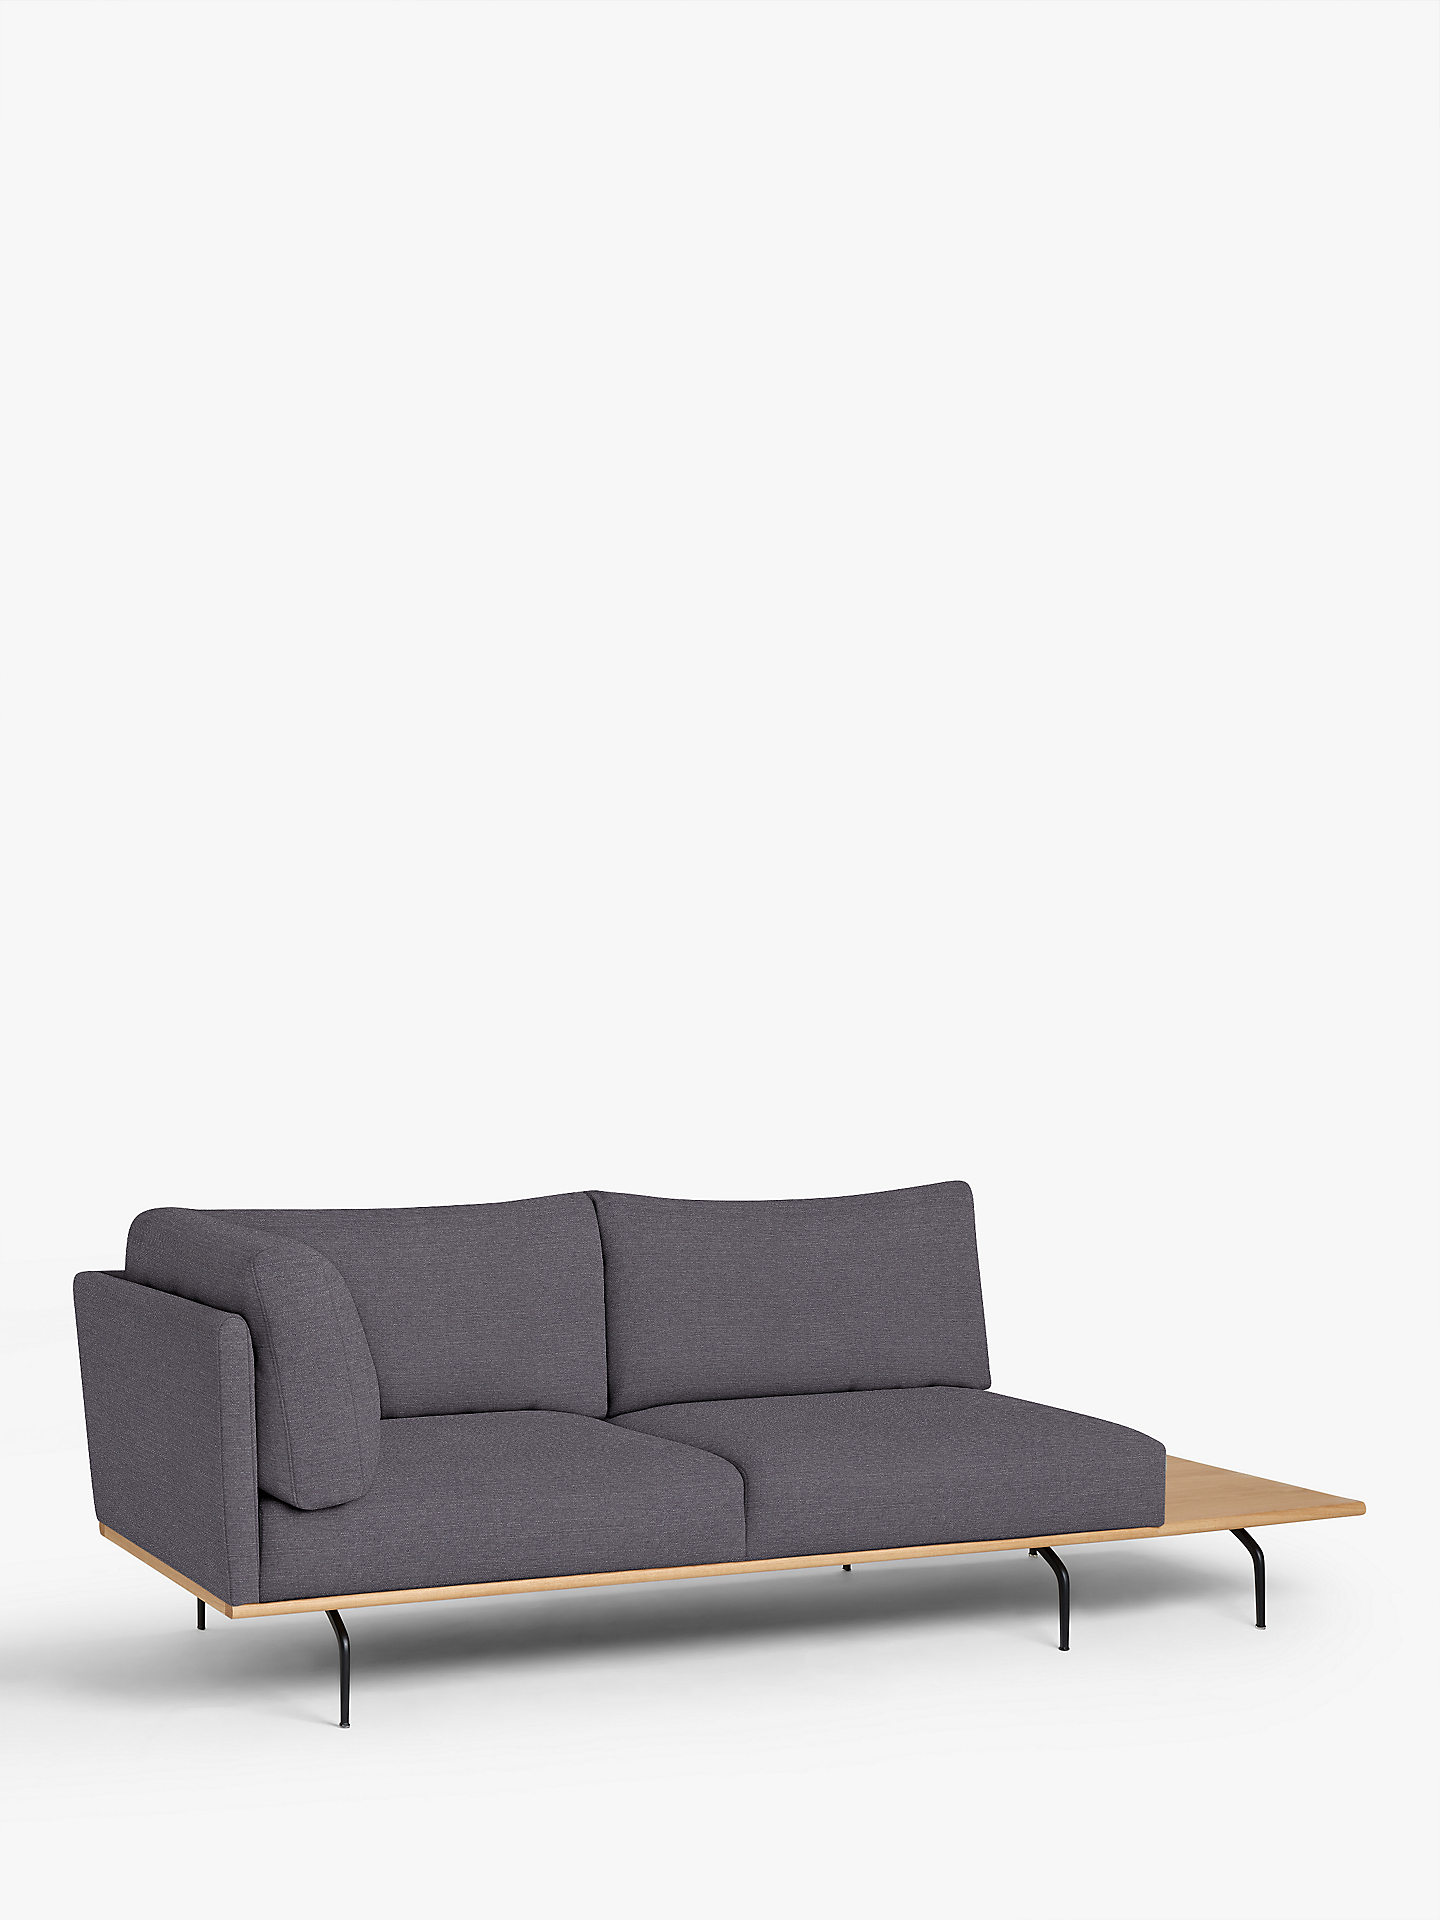 Buy John Lewis & Partners Platform Large 3 Seater Sofa with RHF Table Online at johnlewis.com